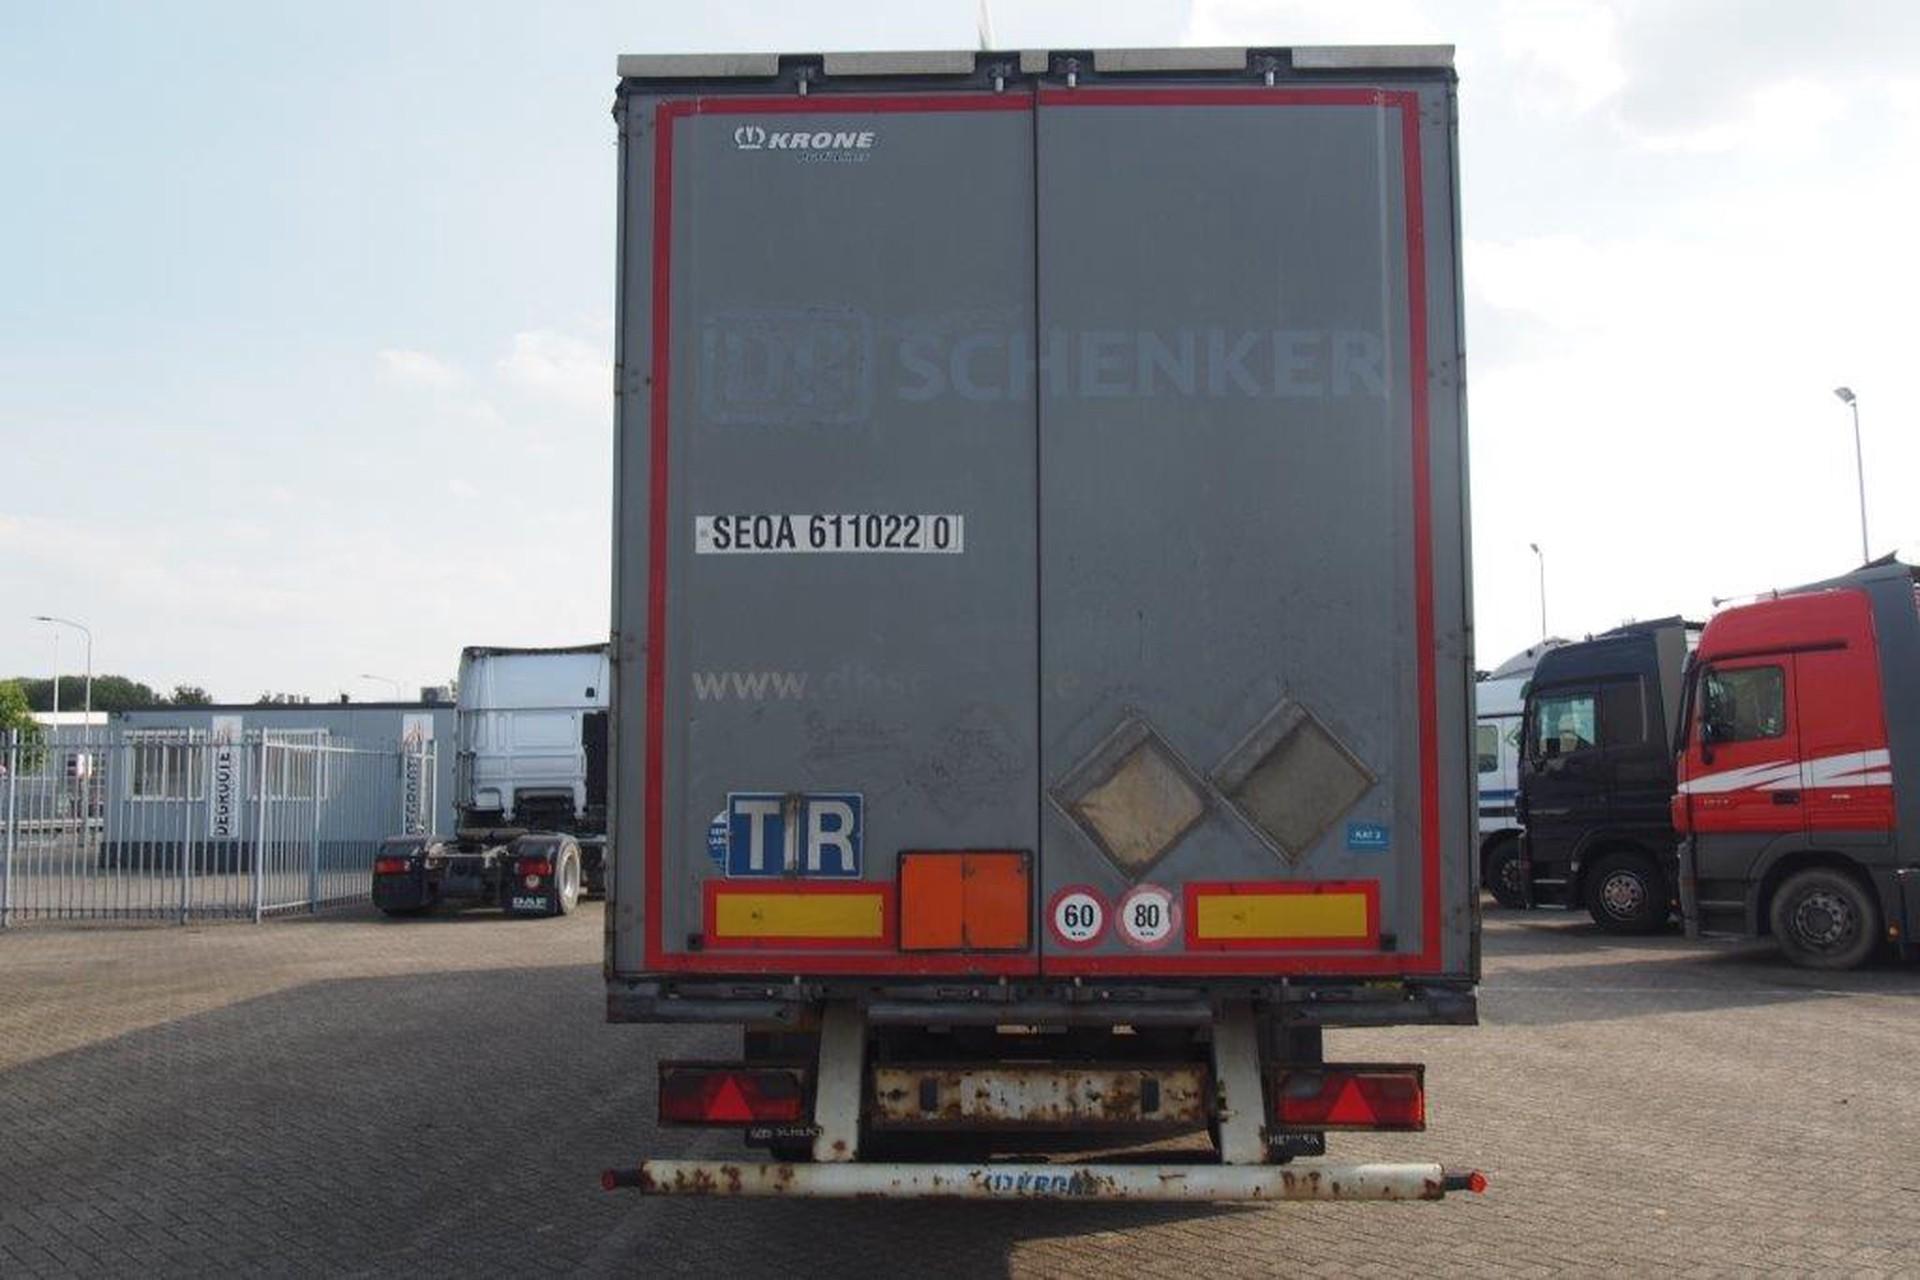 Krone Profi Liner (TIR)